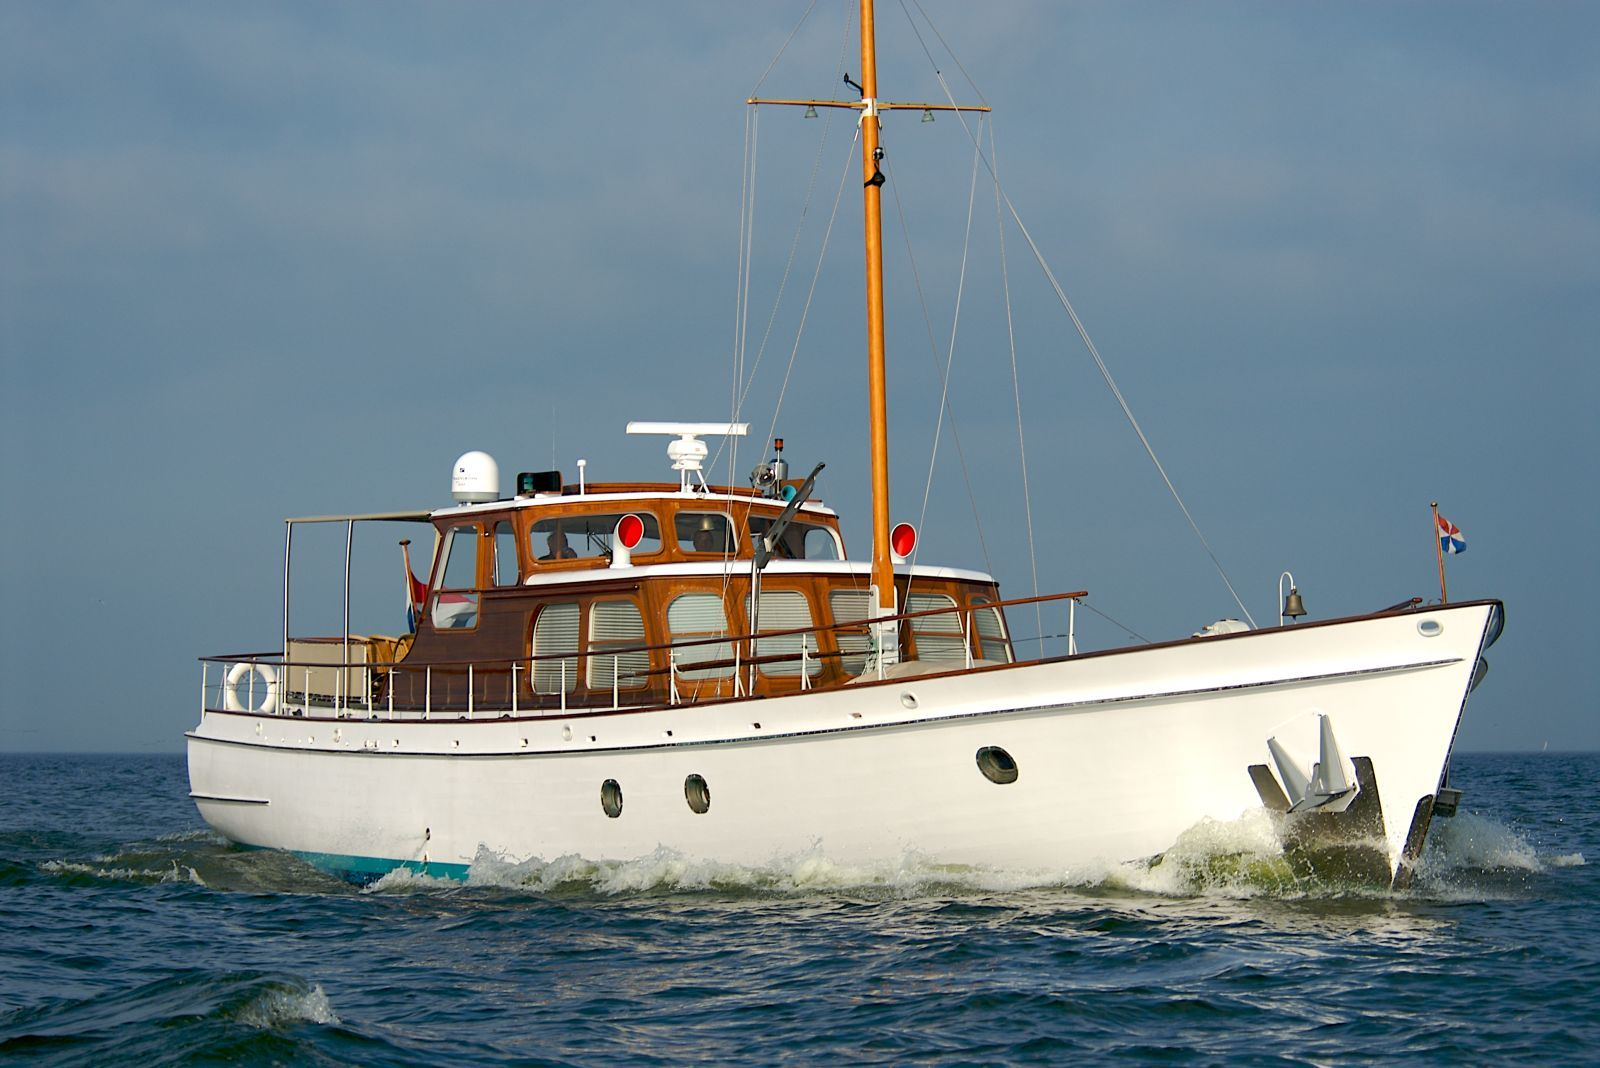 82 39 atalanta 1958 feadship motor yacht schiffe pinterest boote yachten und oldtimer. Black Bedroom Furniture Sets. Home Design Ideas